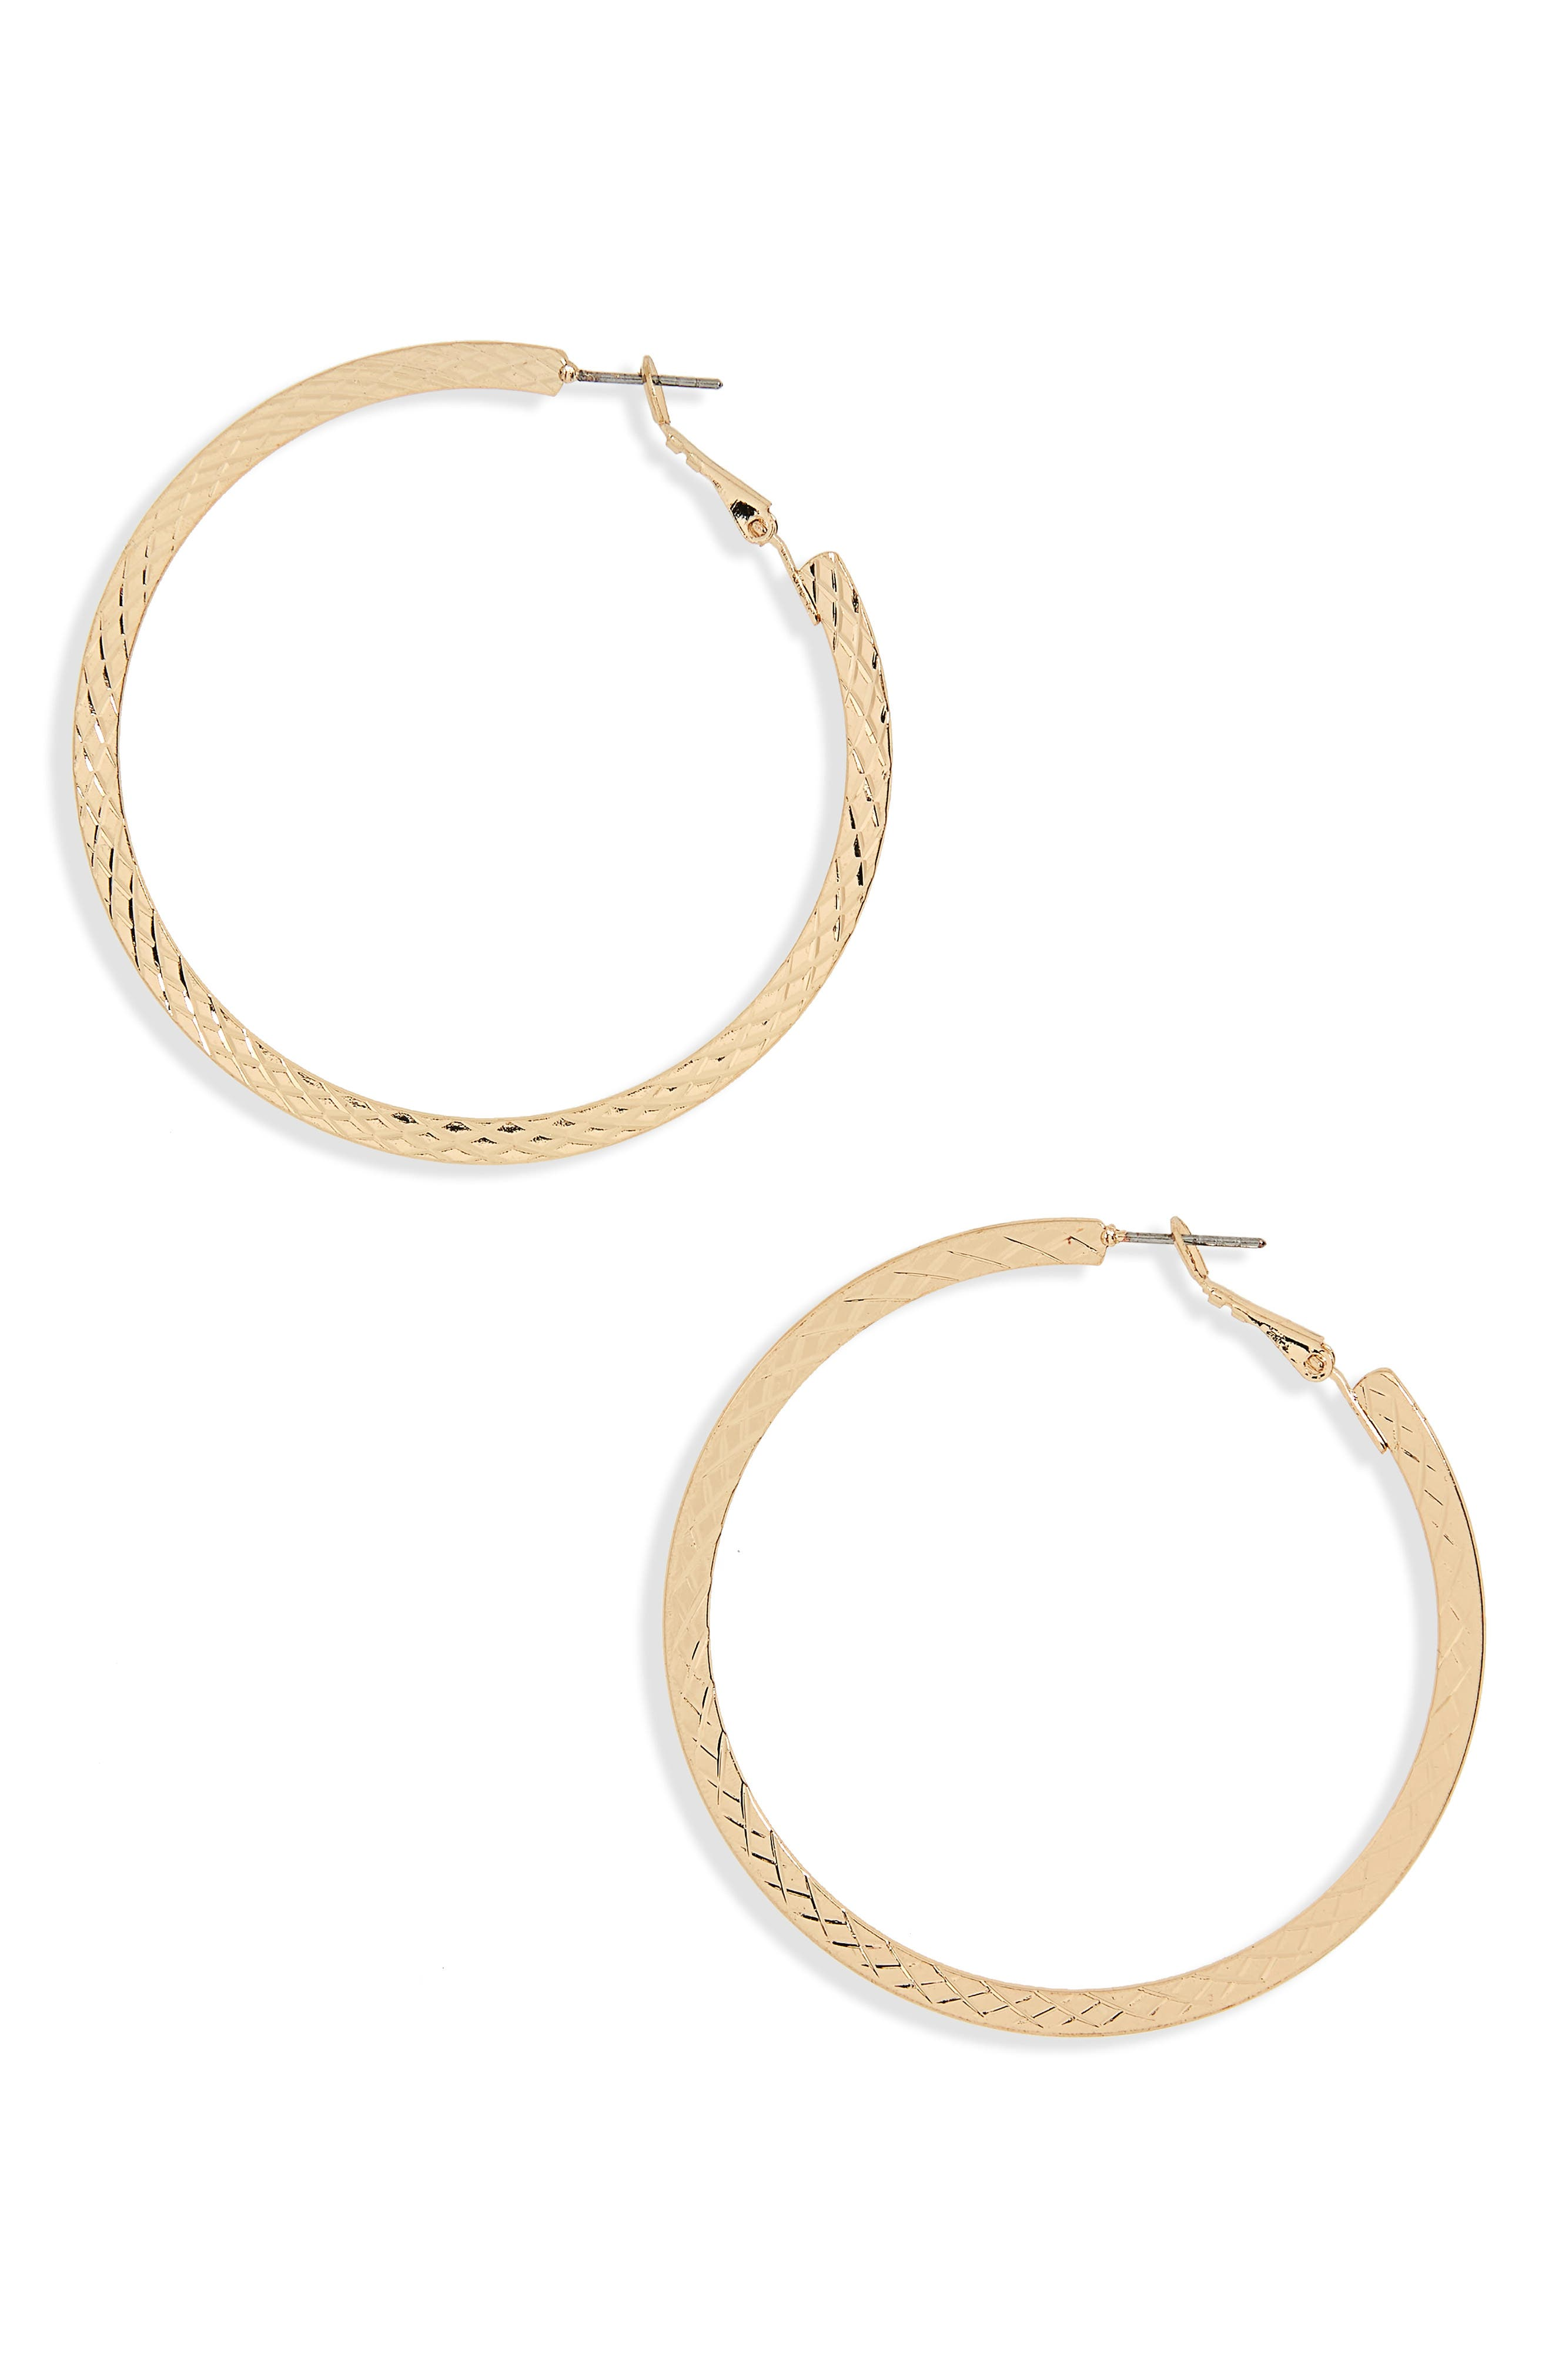 Etched Flat Hoop Earrings,                             Main thumbnail 1, color,